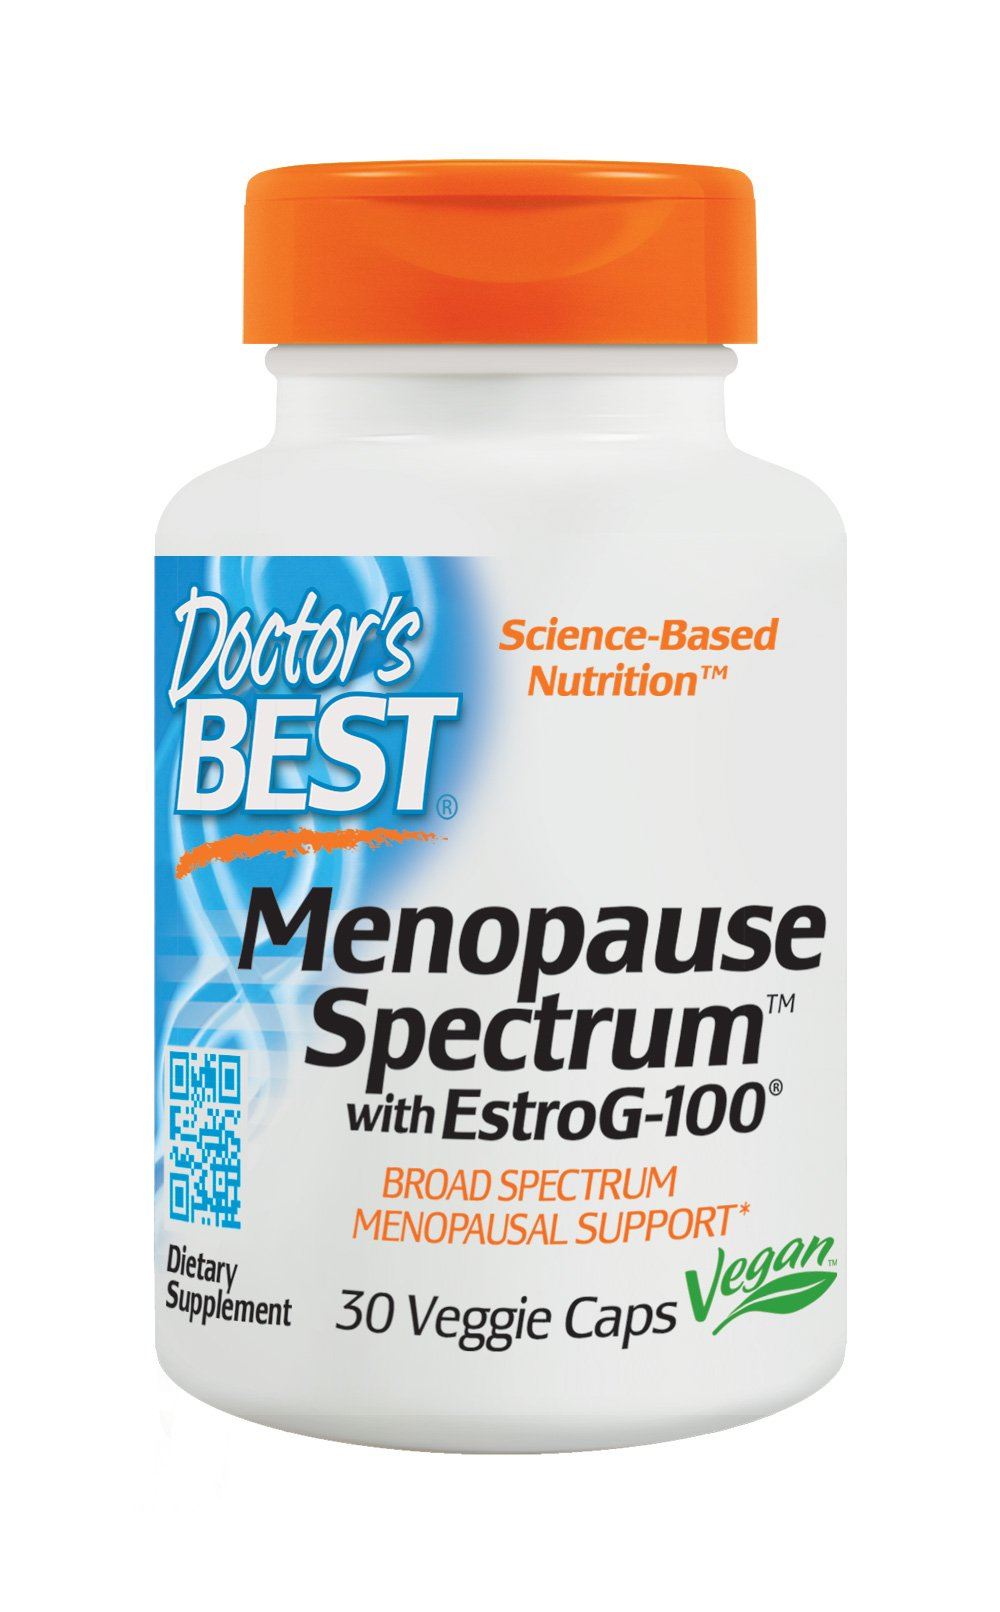 Doctor's Best Menopause Spectrum with EstroG-100, Non-GMO, Vegan, Gluten Free, Soy Free, 30 Veggie Caps by Doctor's Best